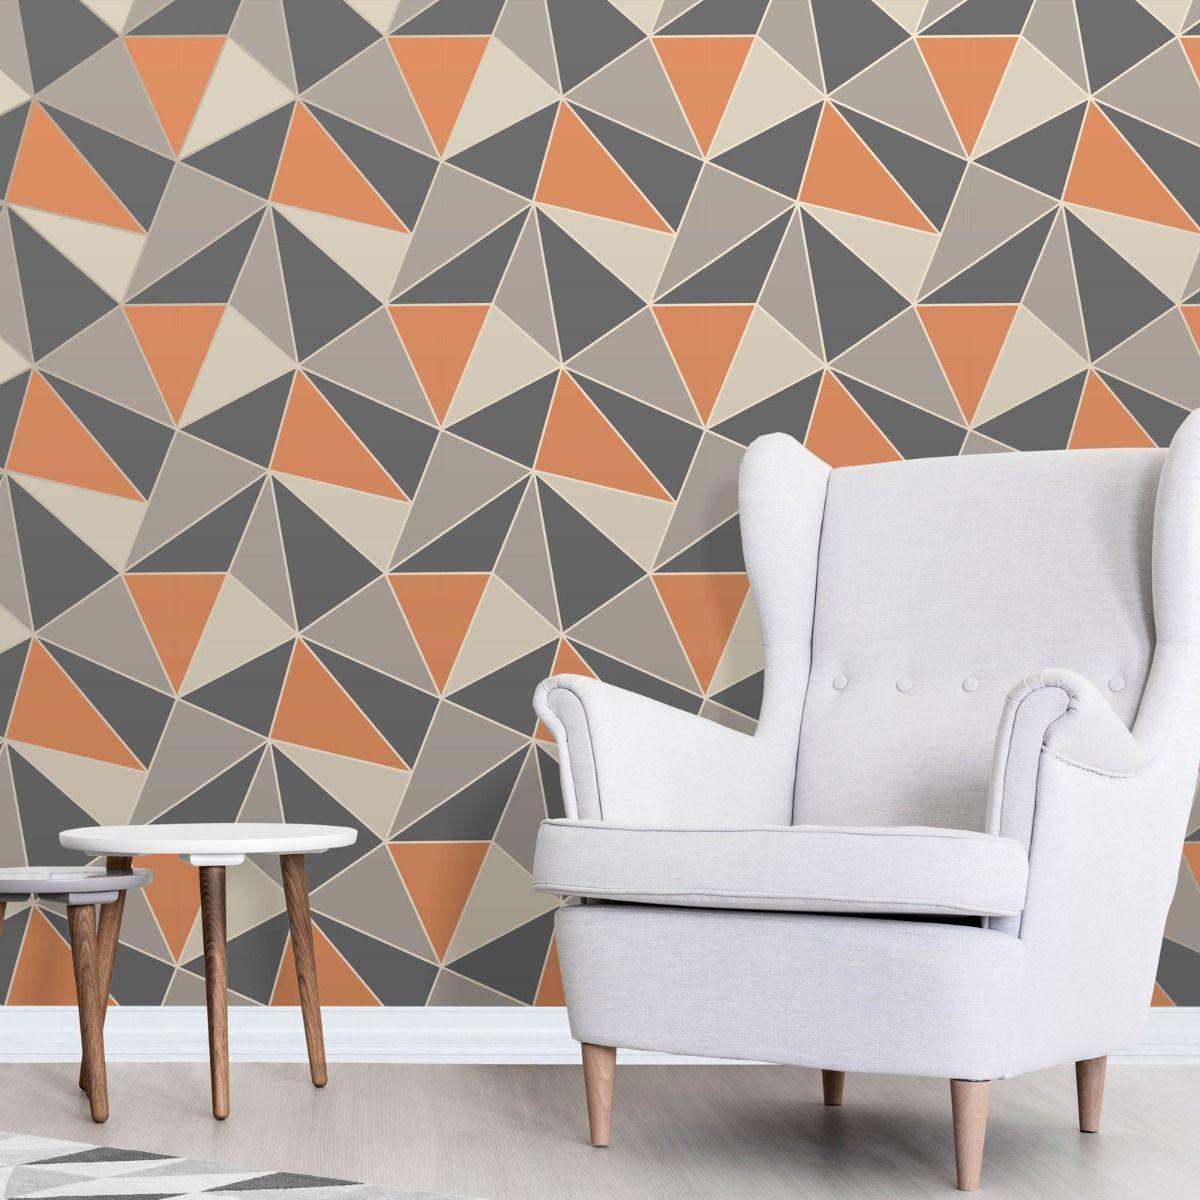 Apex Geometric Wallpaper Burnt Orange and Grey Fine Decor